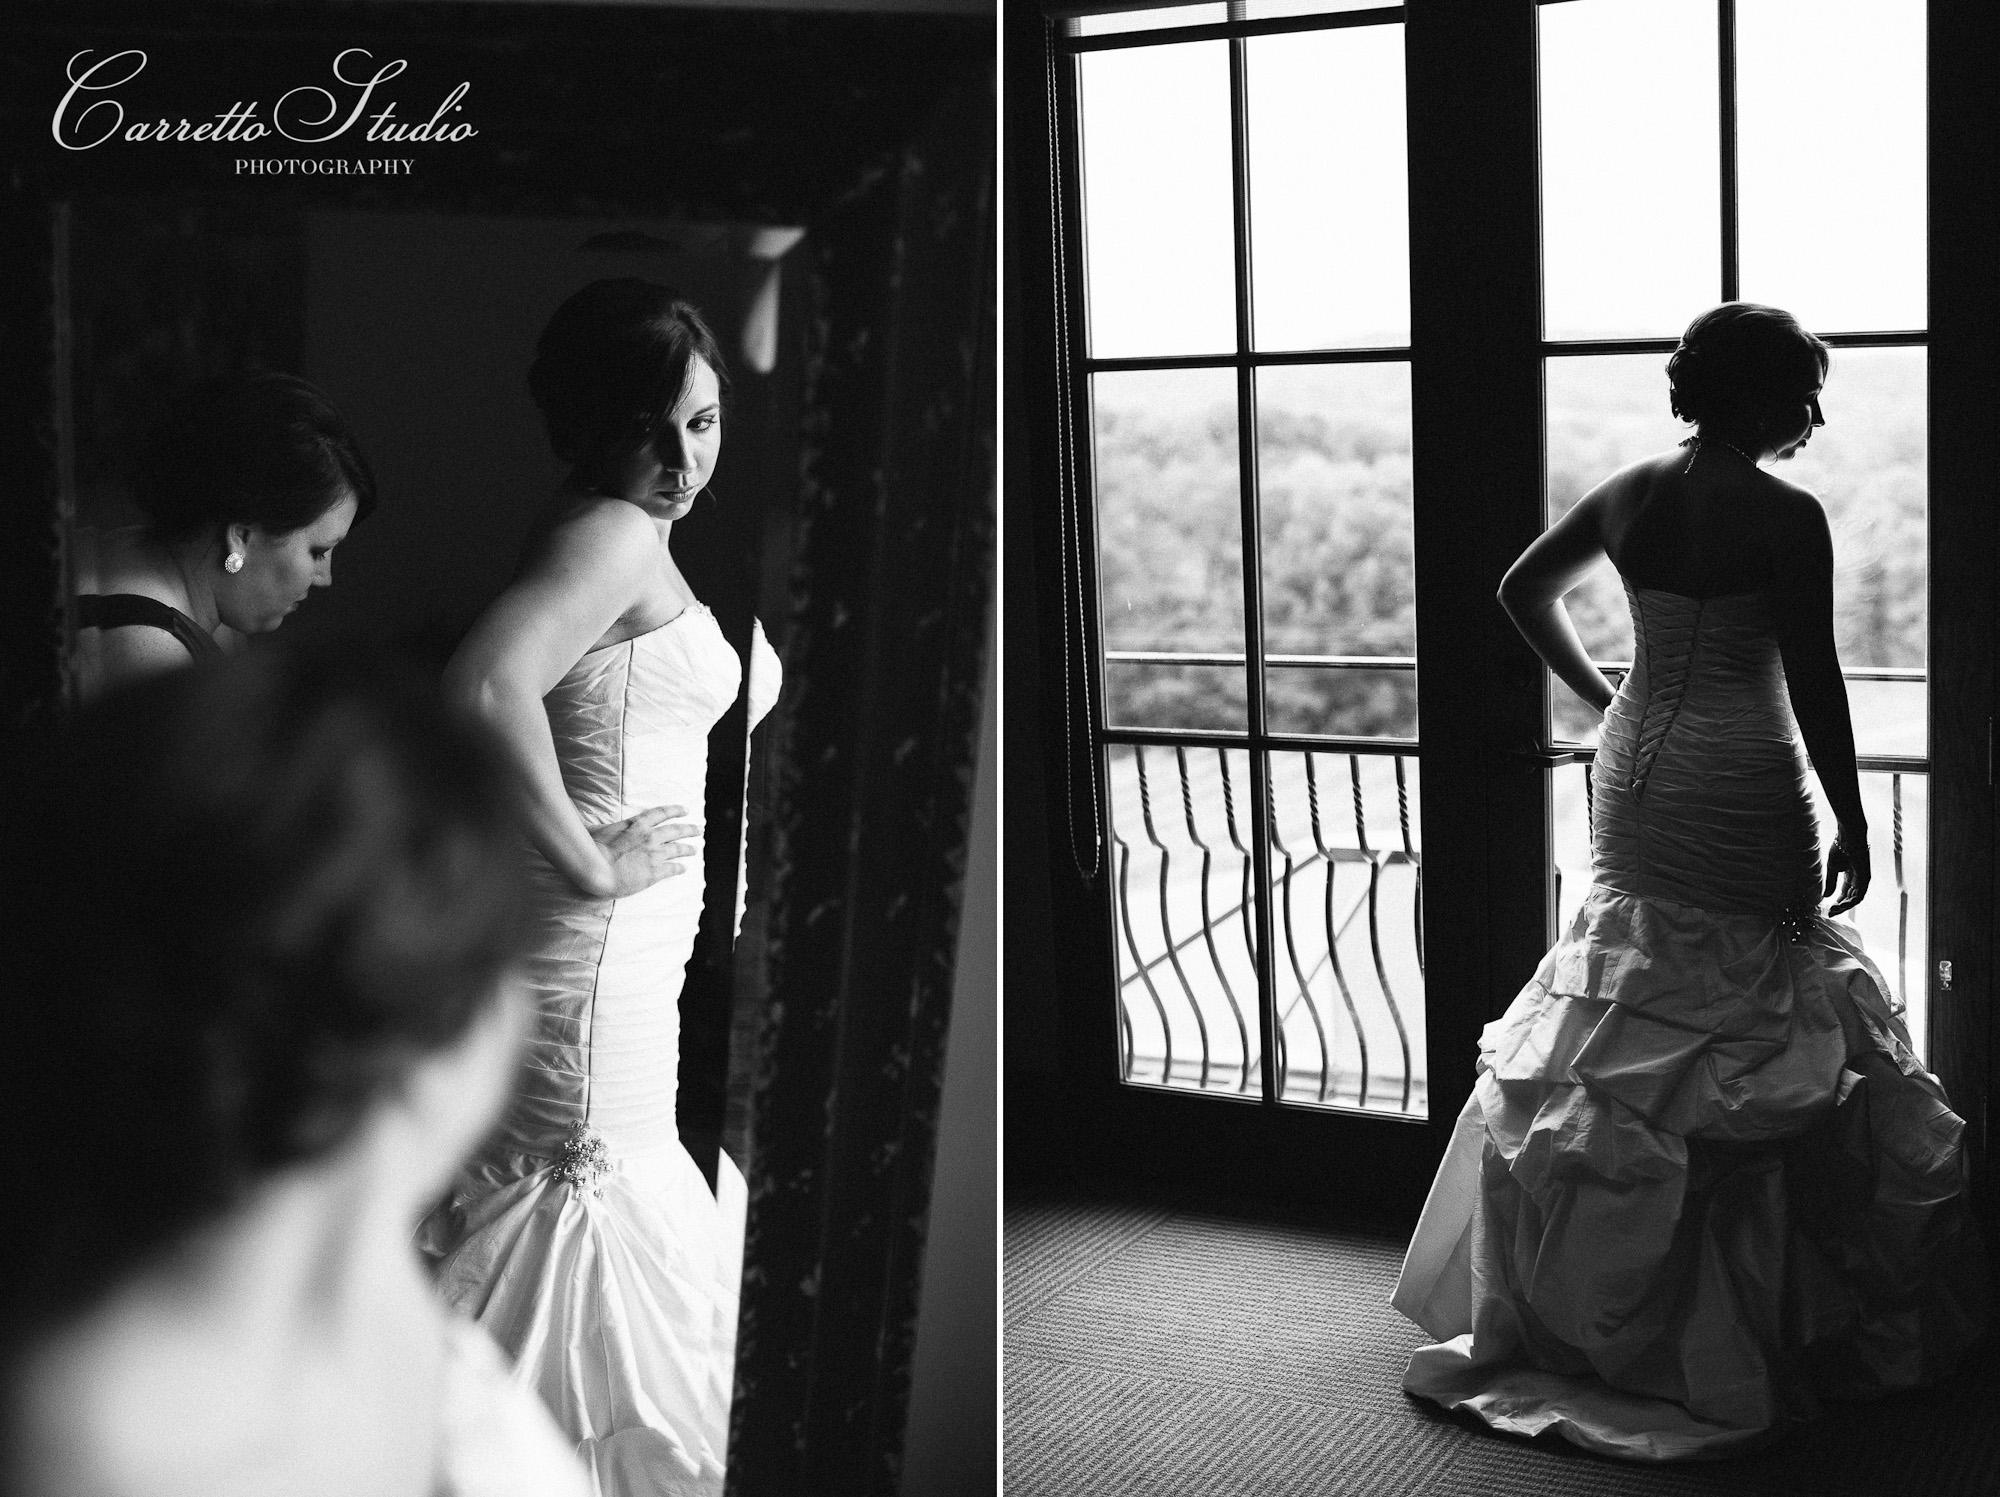 St-Louis-Wedding-Photography-1012.jpg